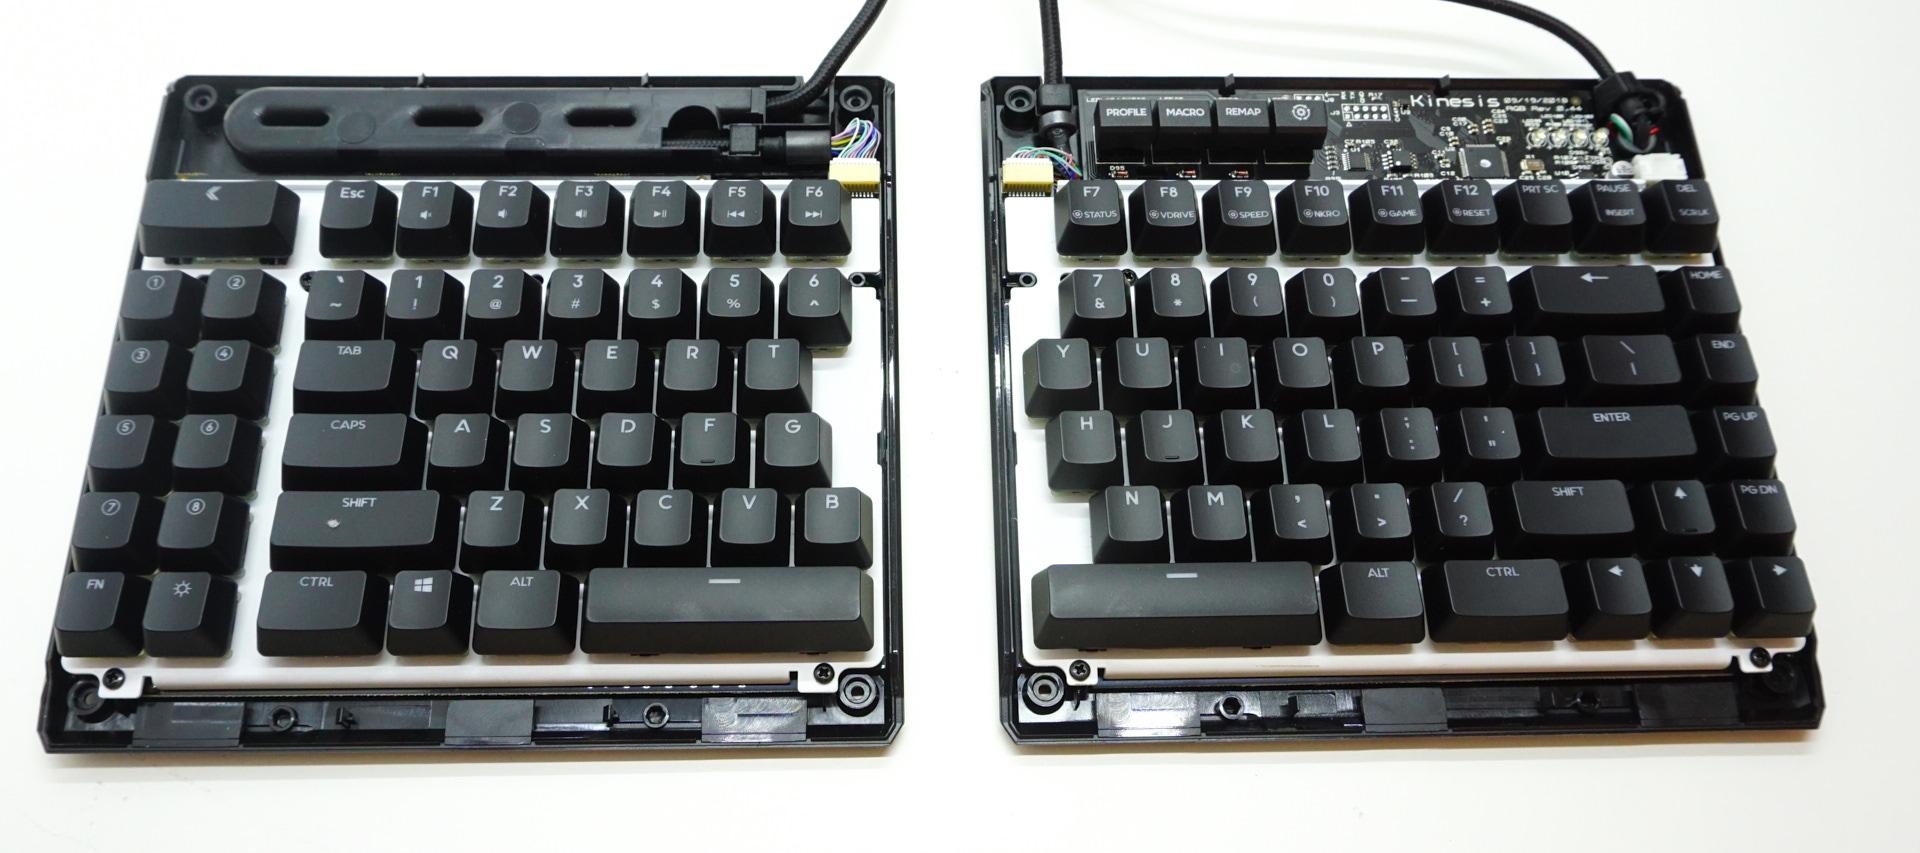 The Kinesis Freestyle Edge RGB Gaming Mechanical Keyboard